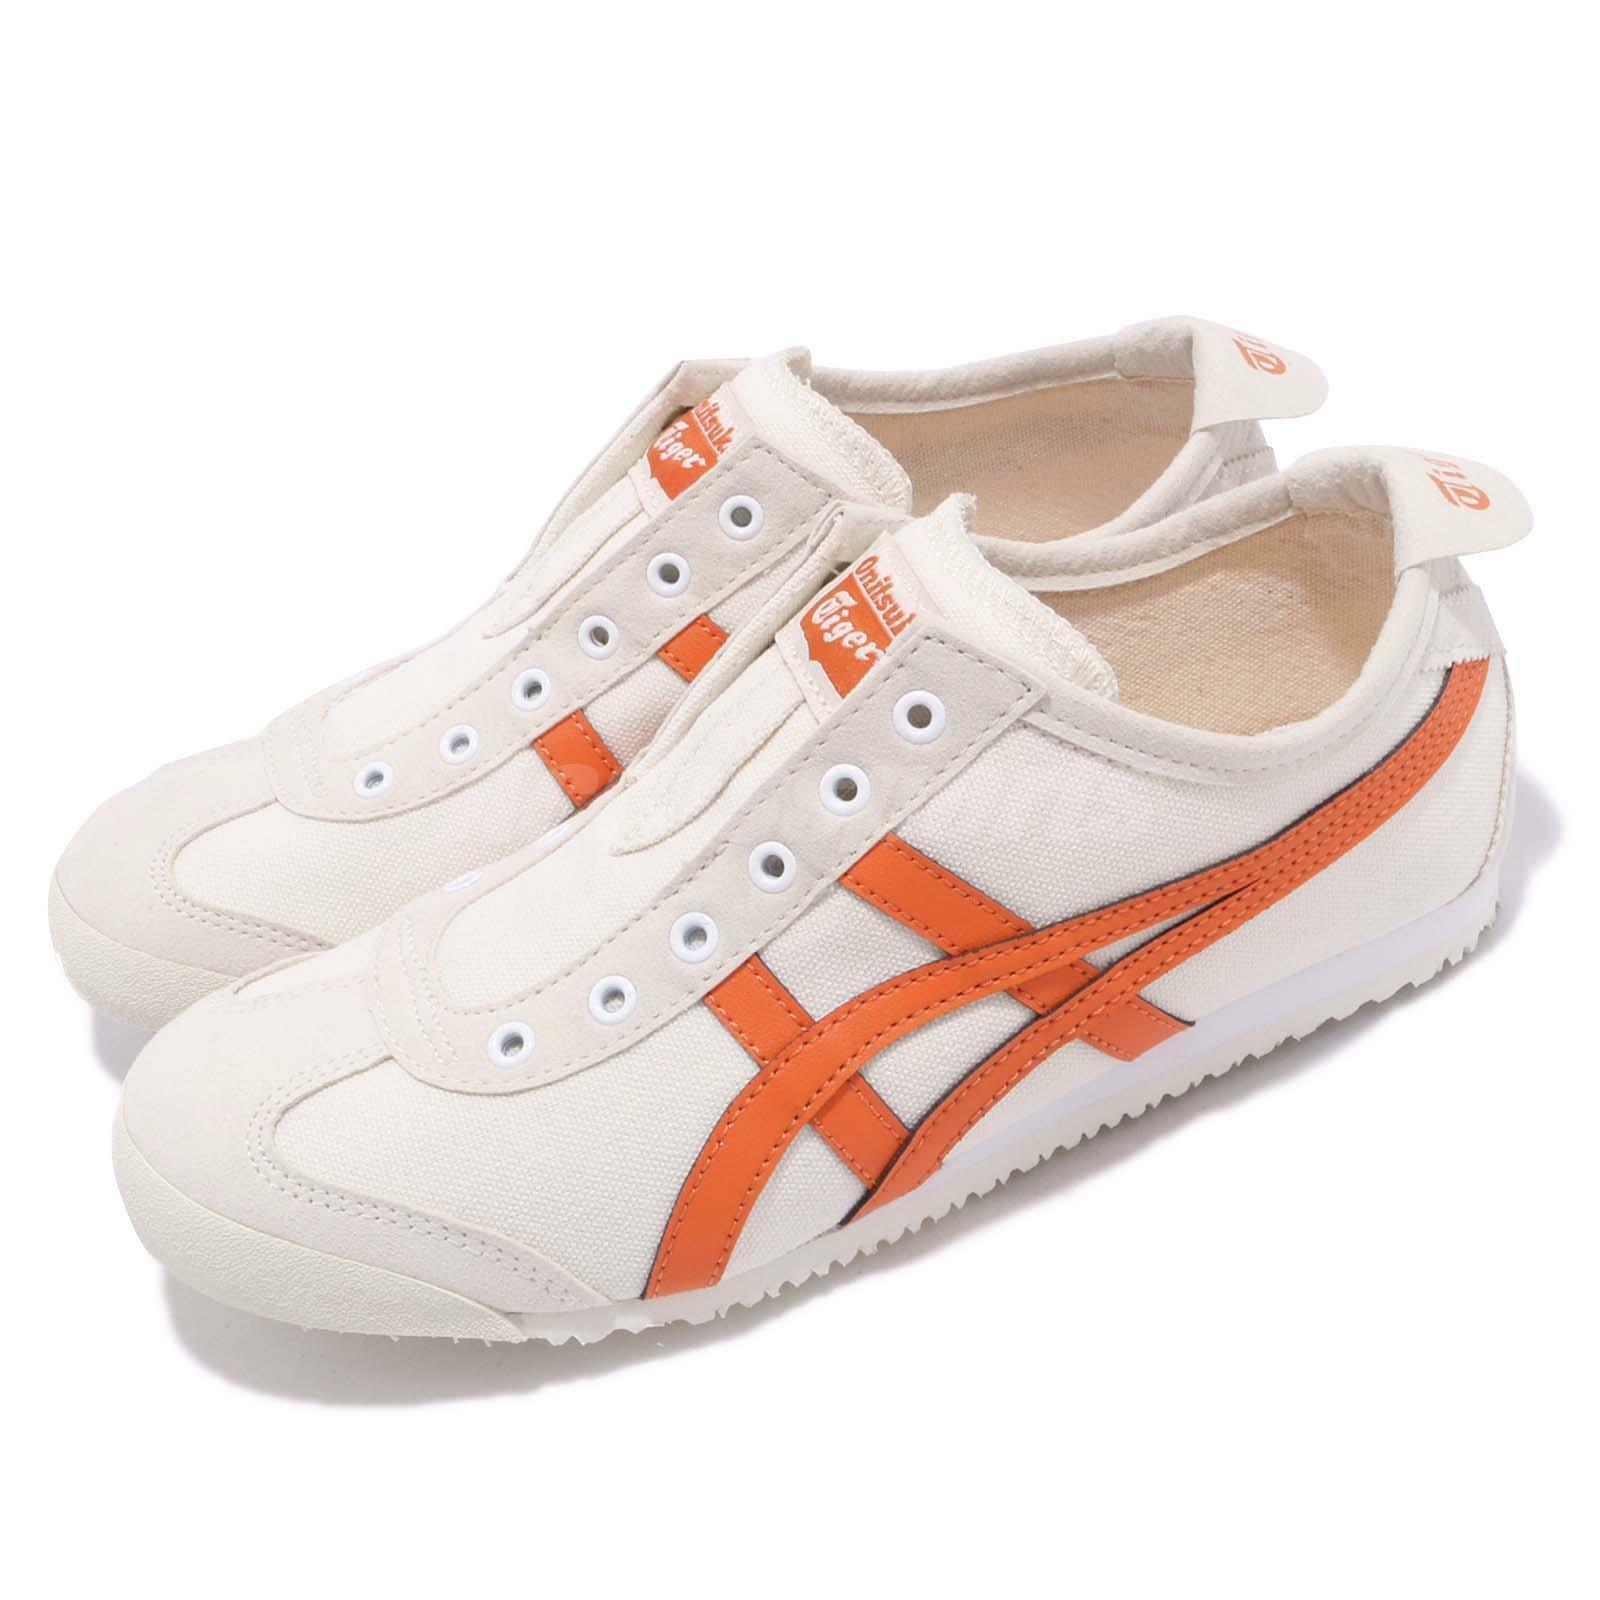 Asics Onithuka Tiger Mexico 66 Slip On Birch orange  Men Women shoes 1183A360-202  enjoy 50% off